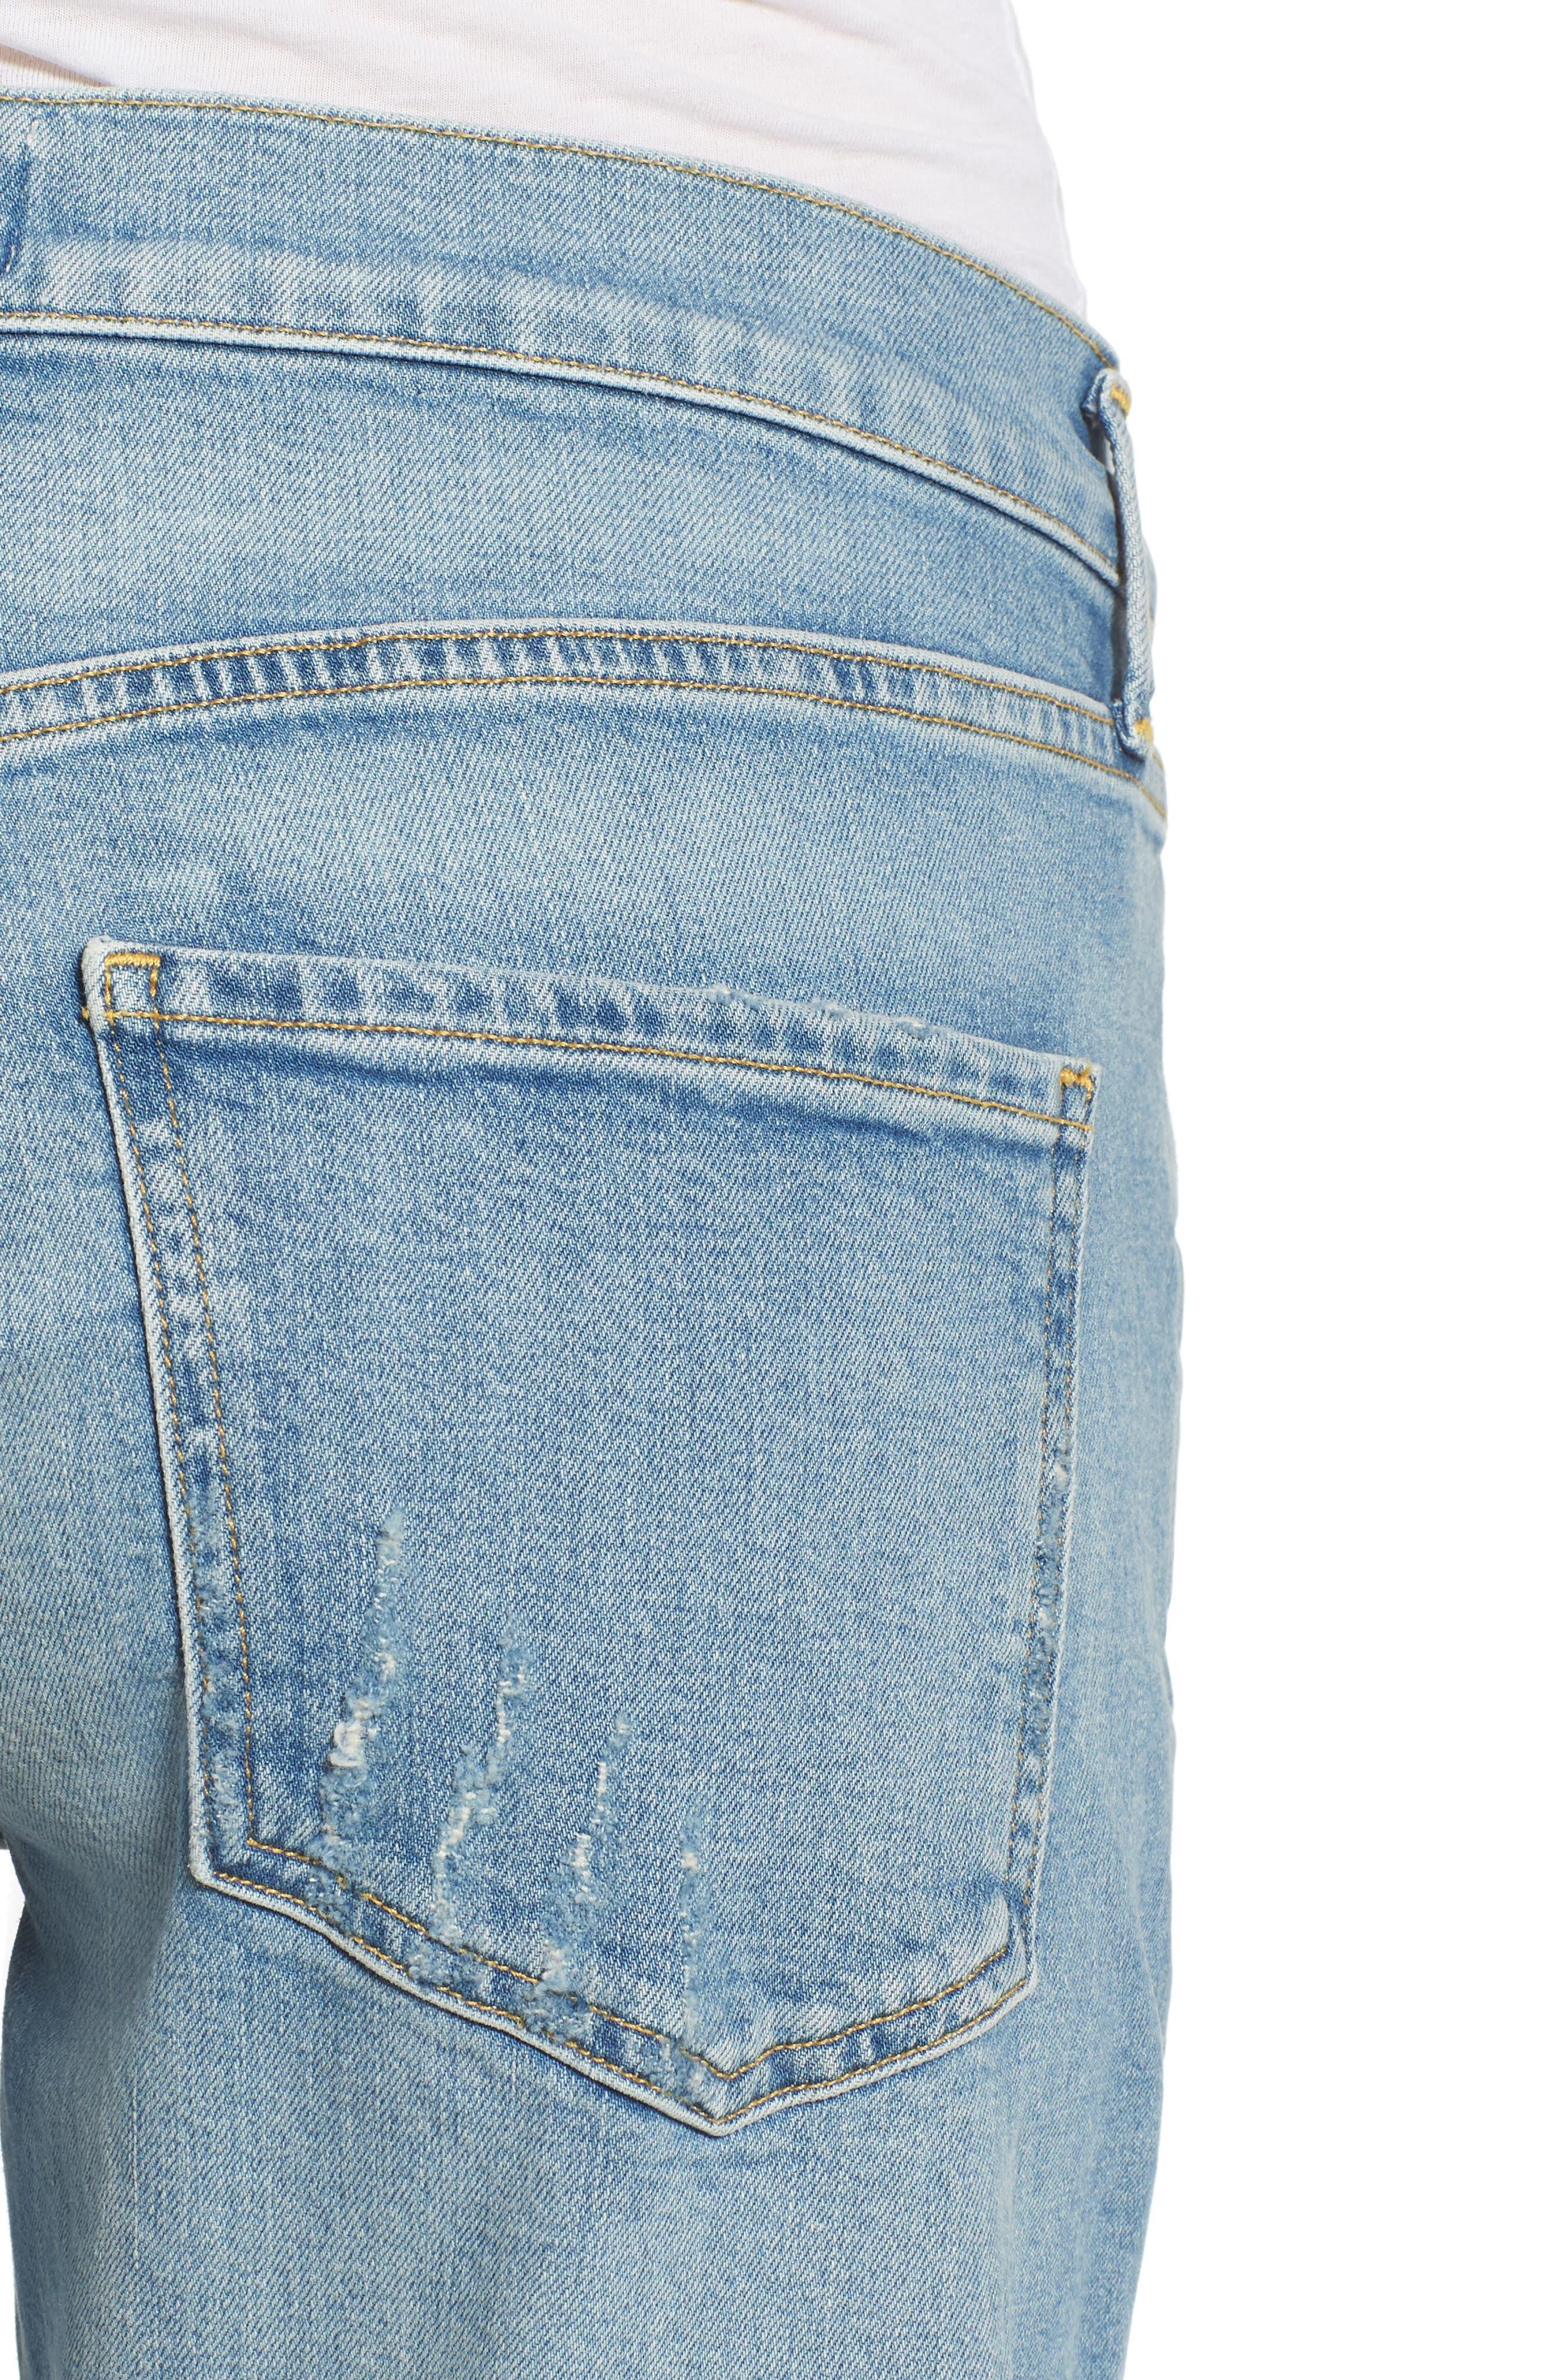 Isabel Ankle Slim Boyfriend Jeans,                             Alternate thumbnail 4, color,                             463